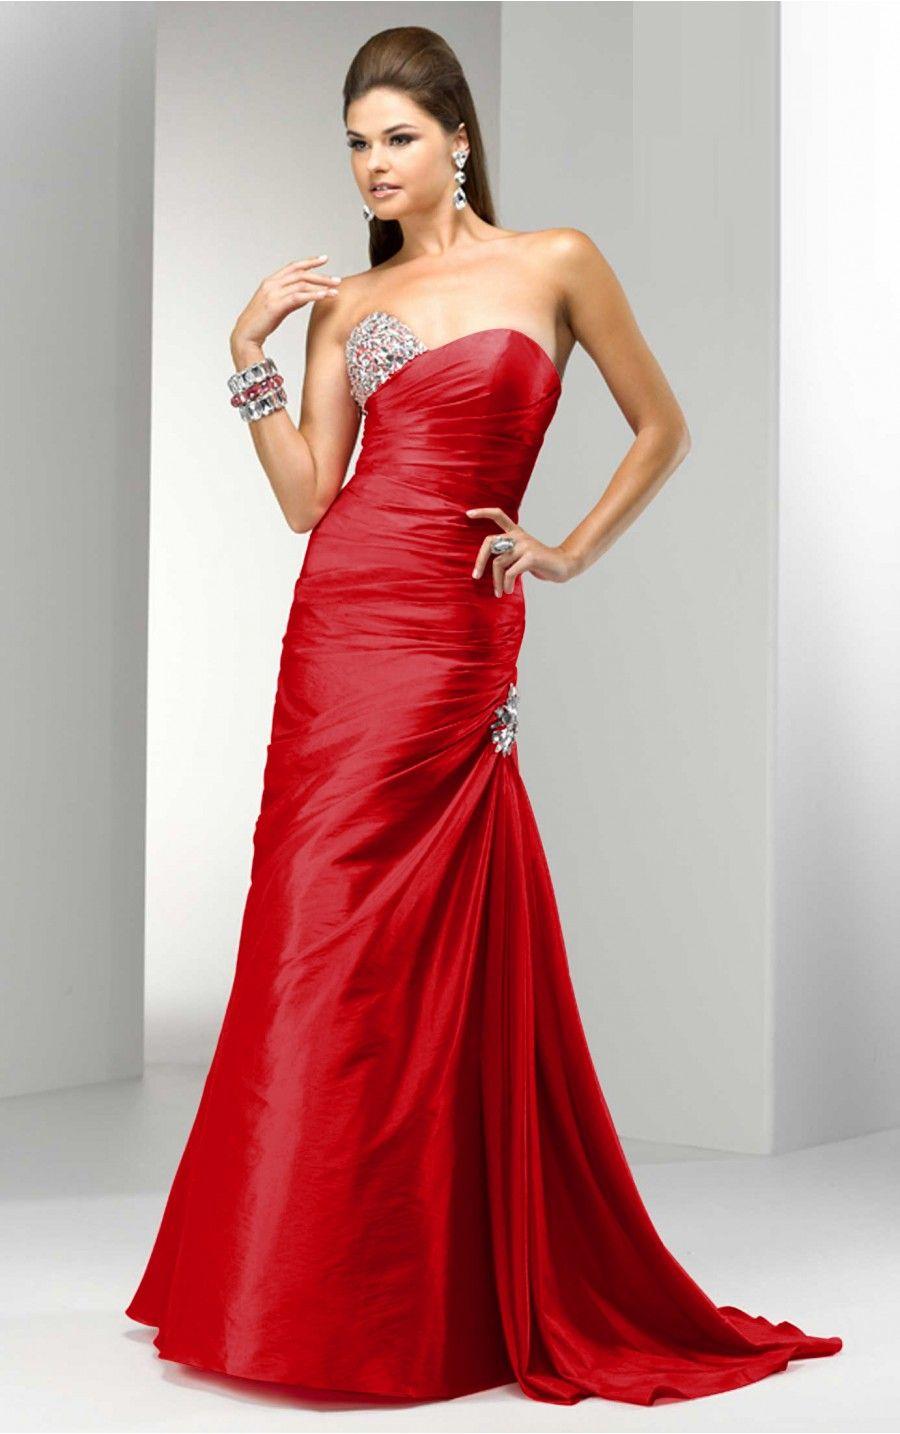 Red Evening Dresses | Evening Dresses | Pinterest | Red formal ...